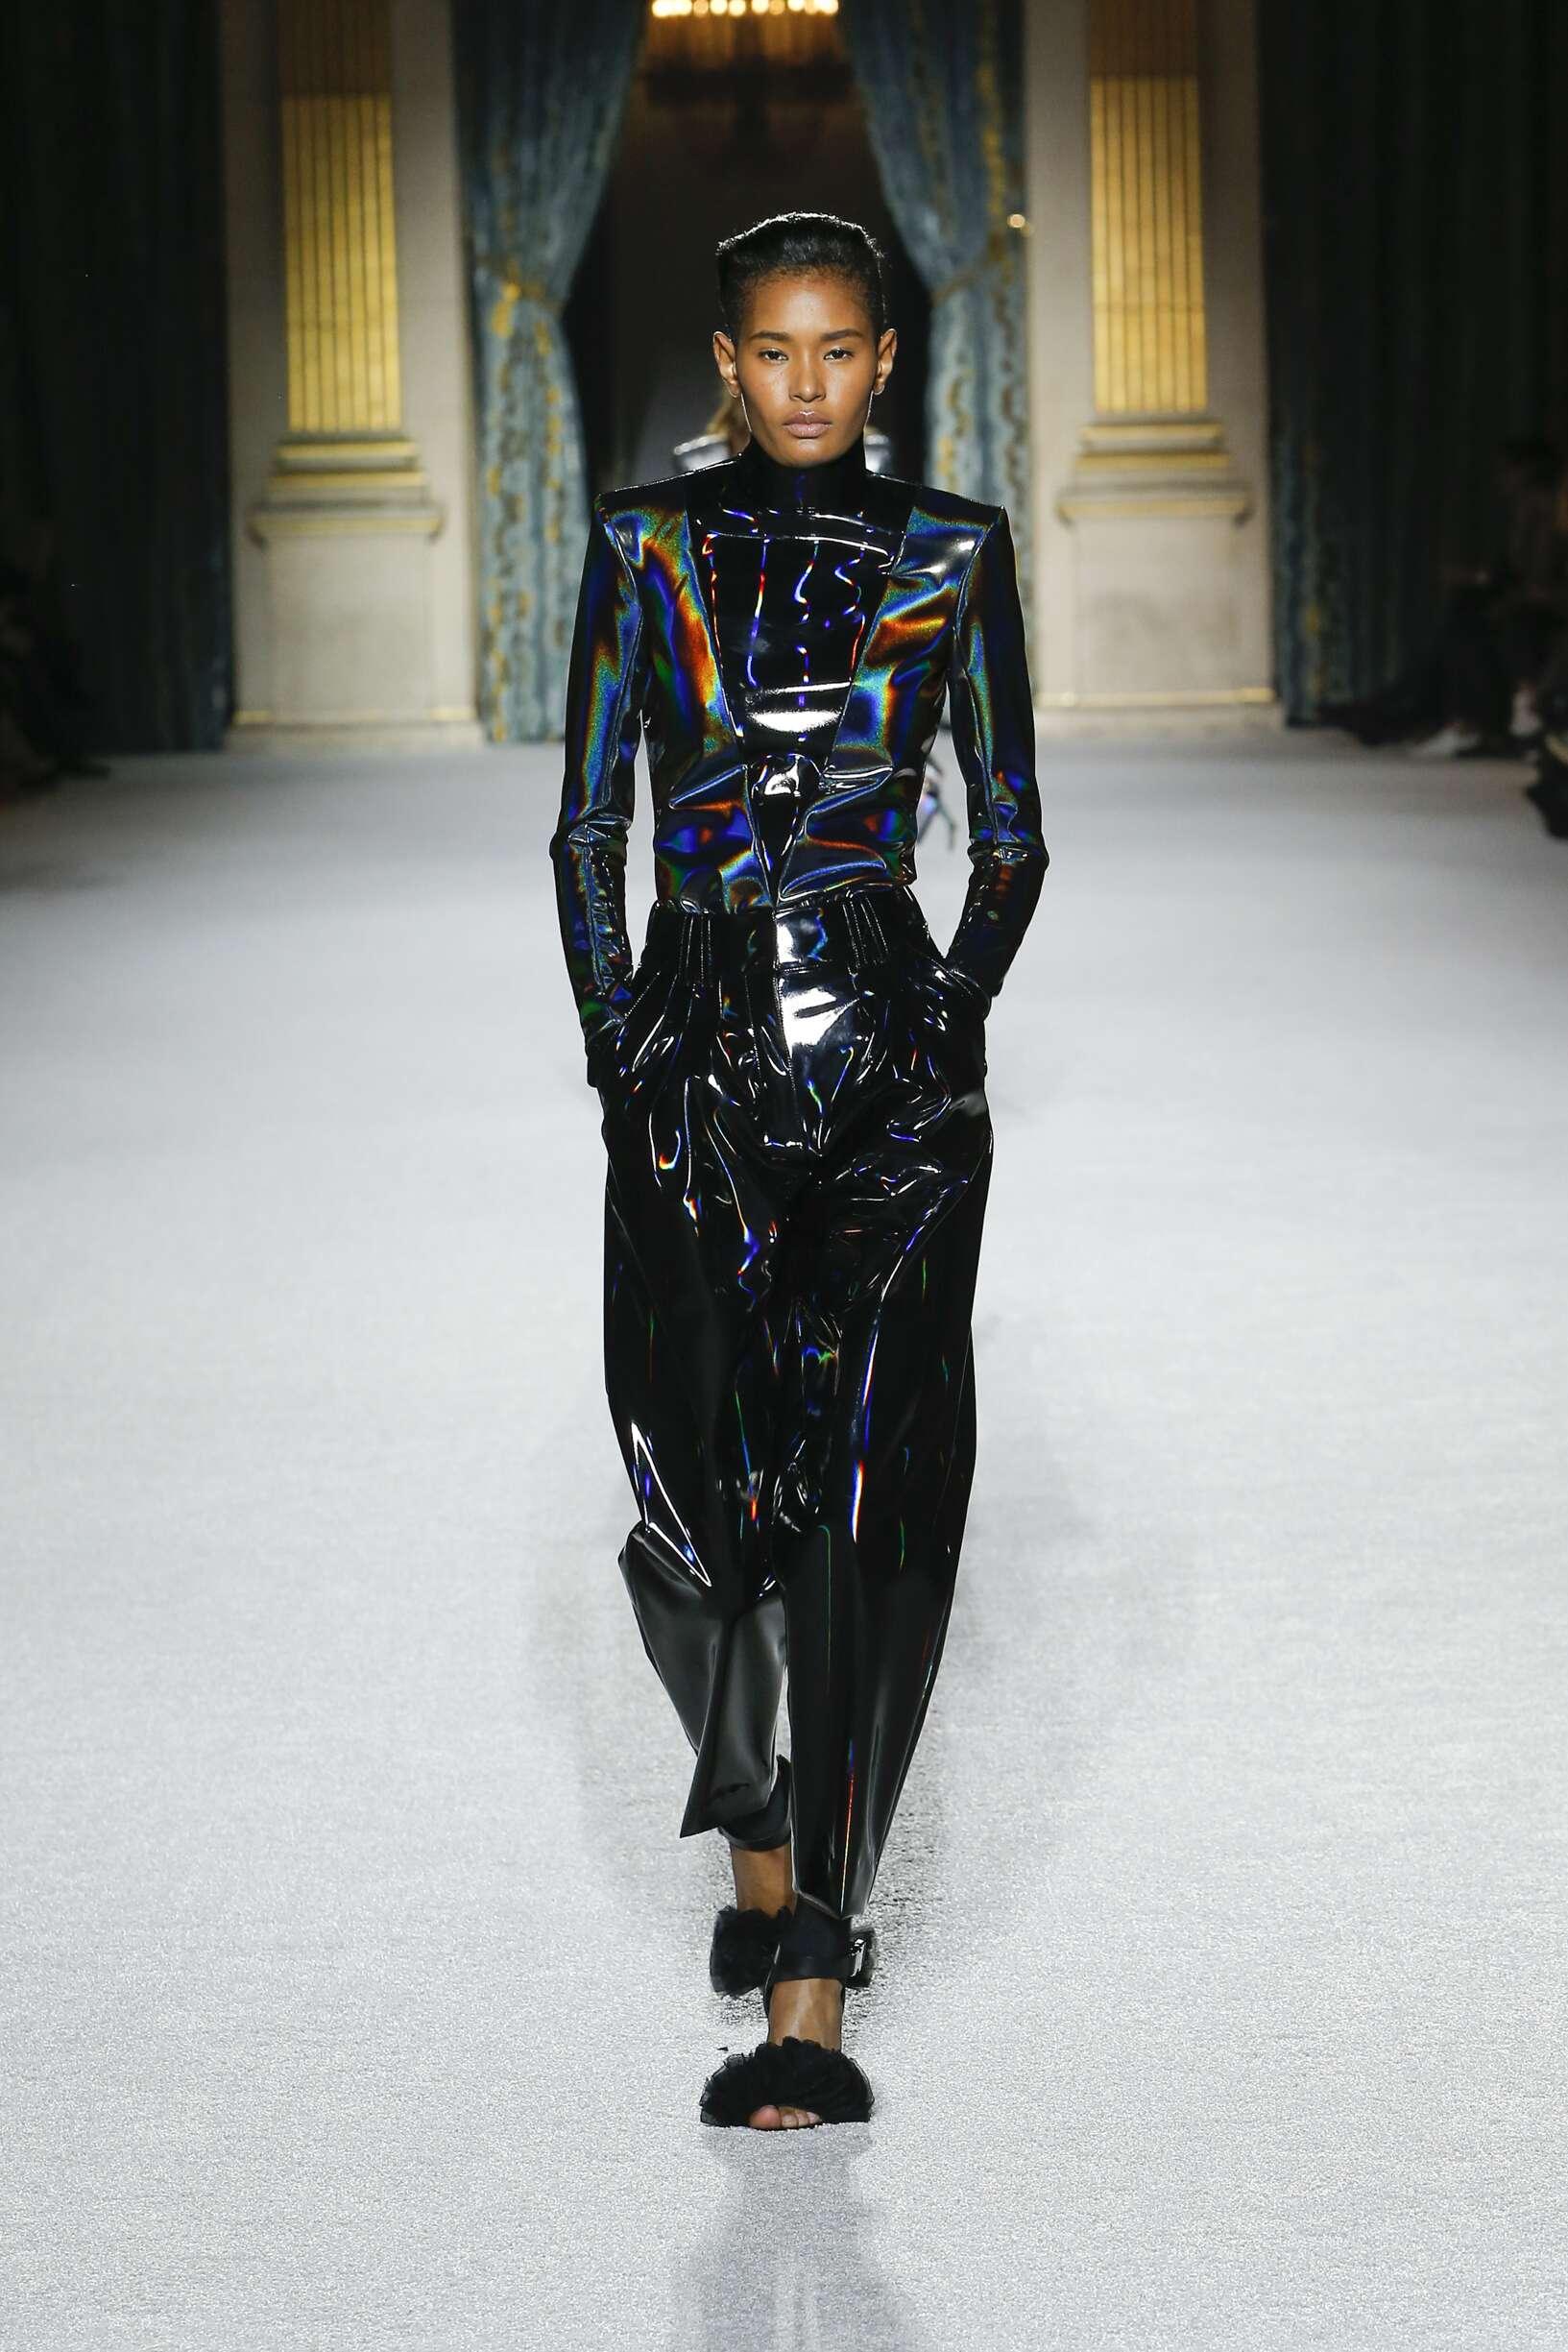 Woman FW 2018 Balmain Show Paris Fashion Week